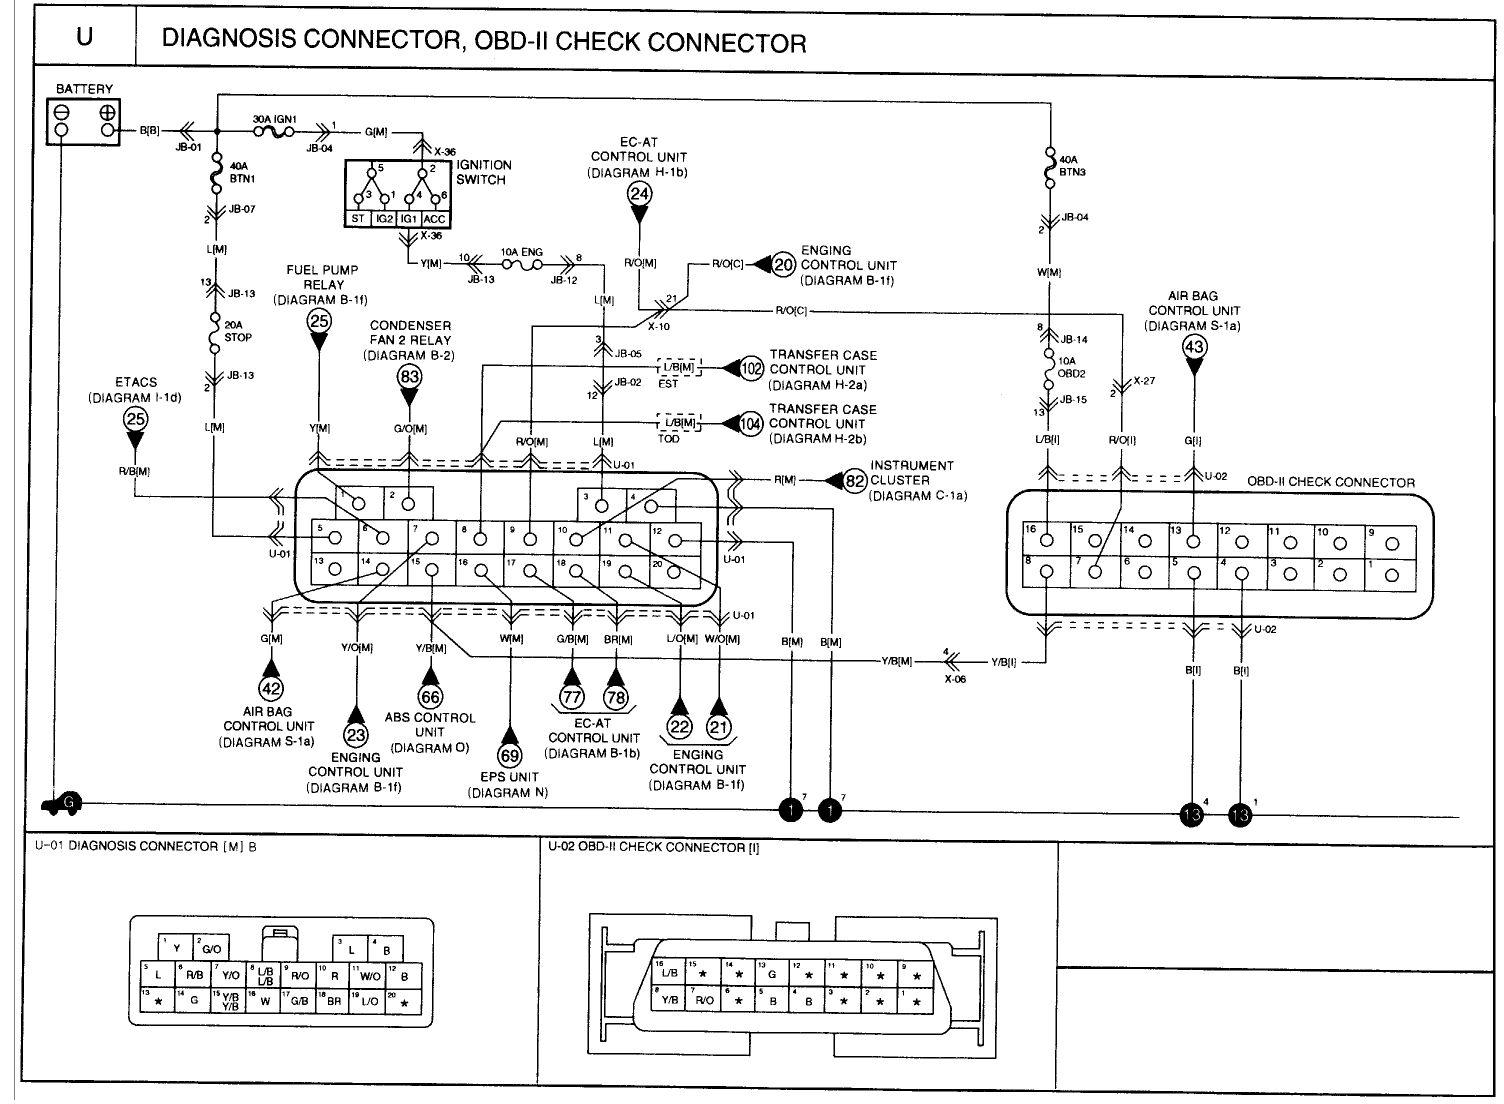 2009 chevy uplander fuse box 2007 chevrolet uplander fuse box location wiring diagrams database  2007 chevrolet uplander fuse box